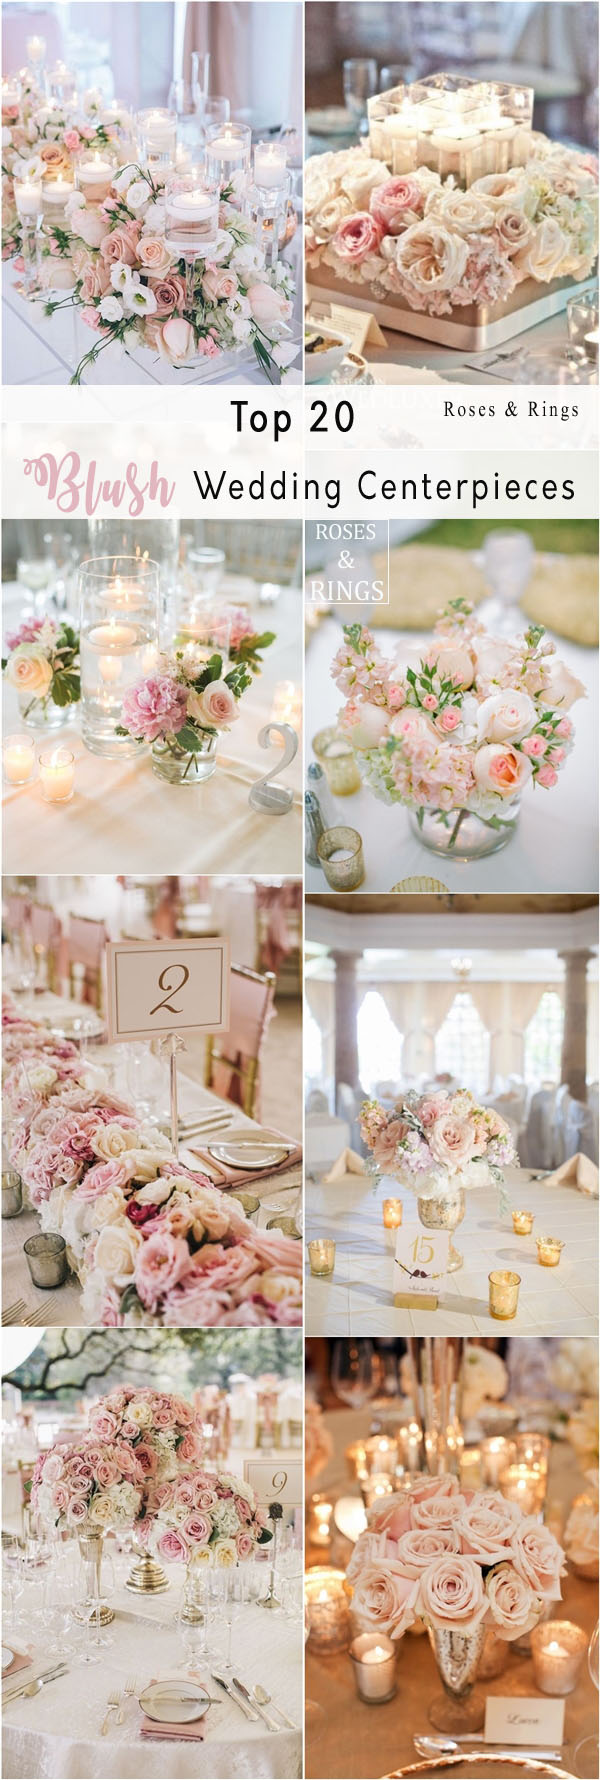 Top 20 Blush Pink Wedding Certerpieces | Roses & Rings